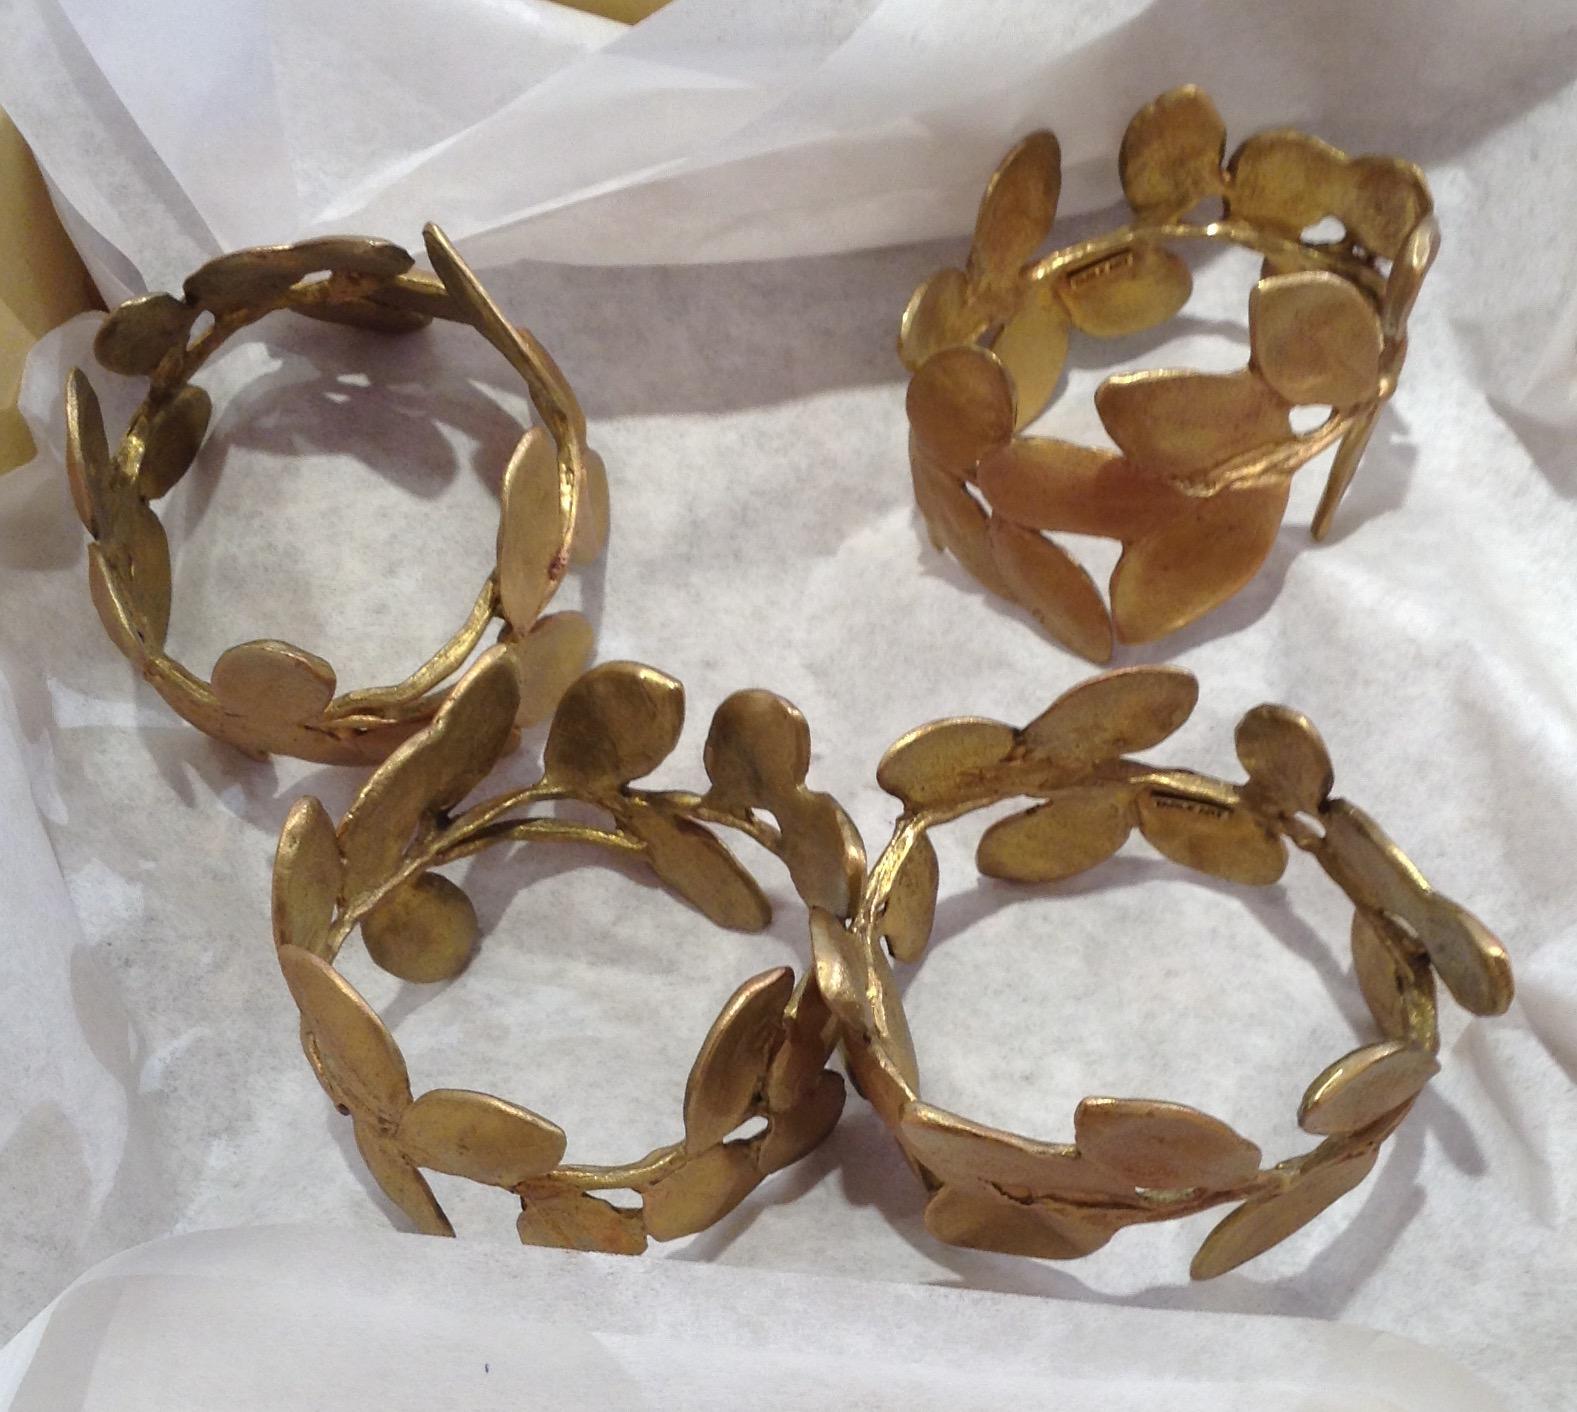 Boxwood Napkin Rings - Gold